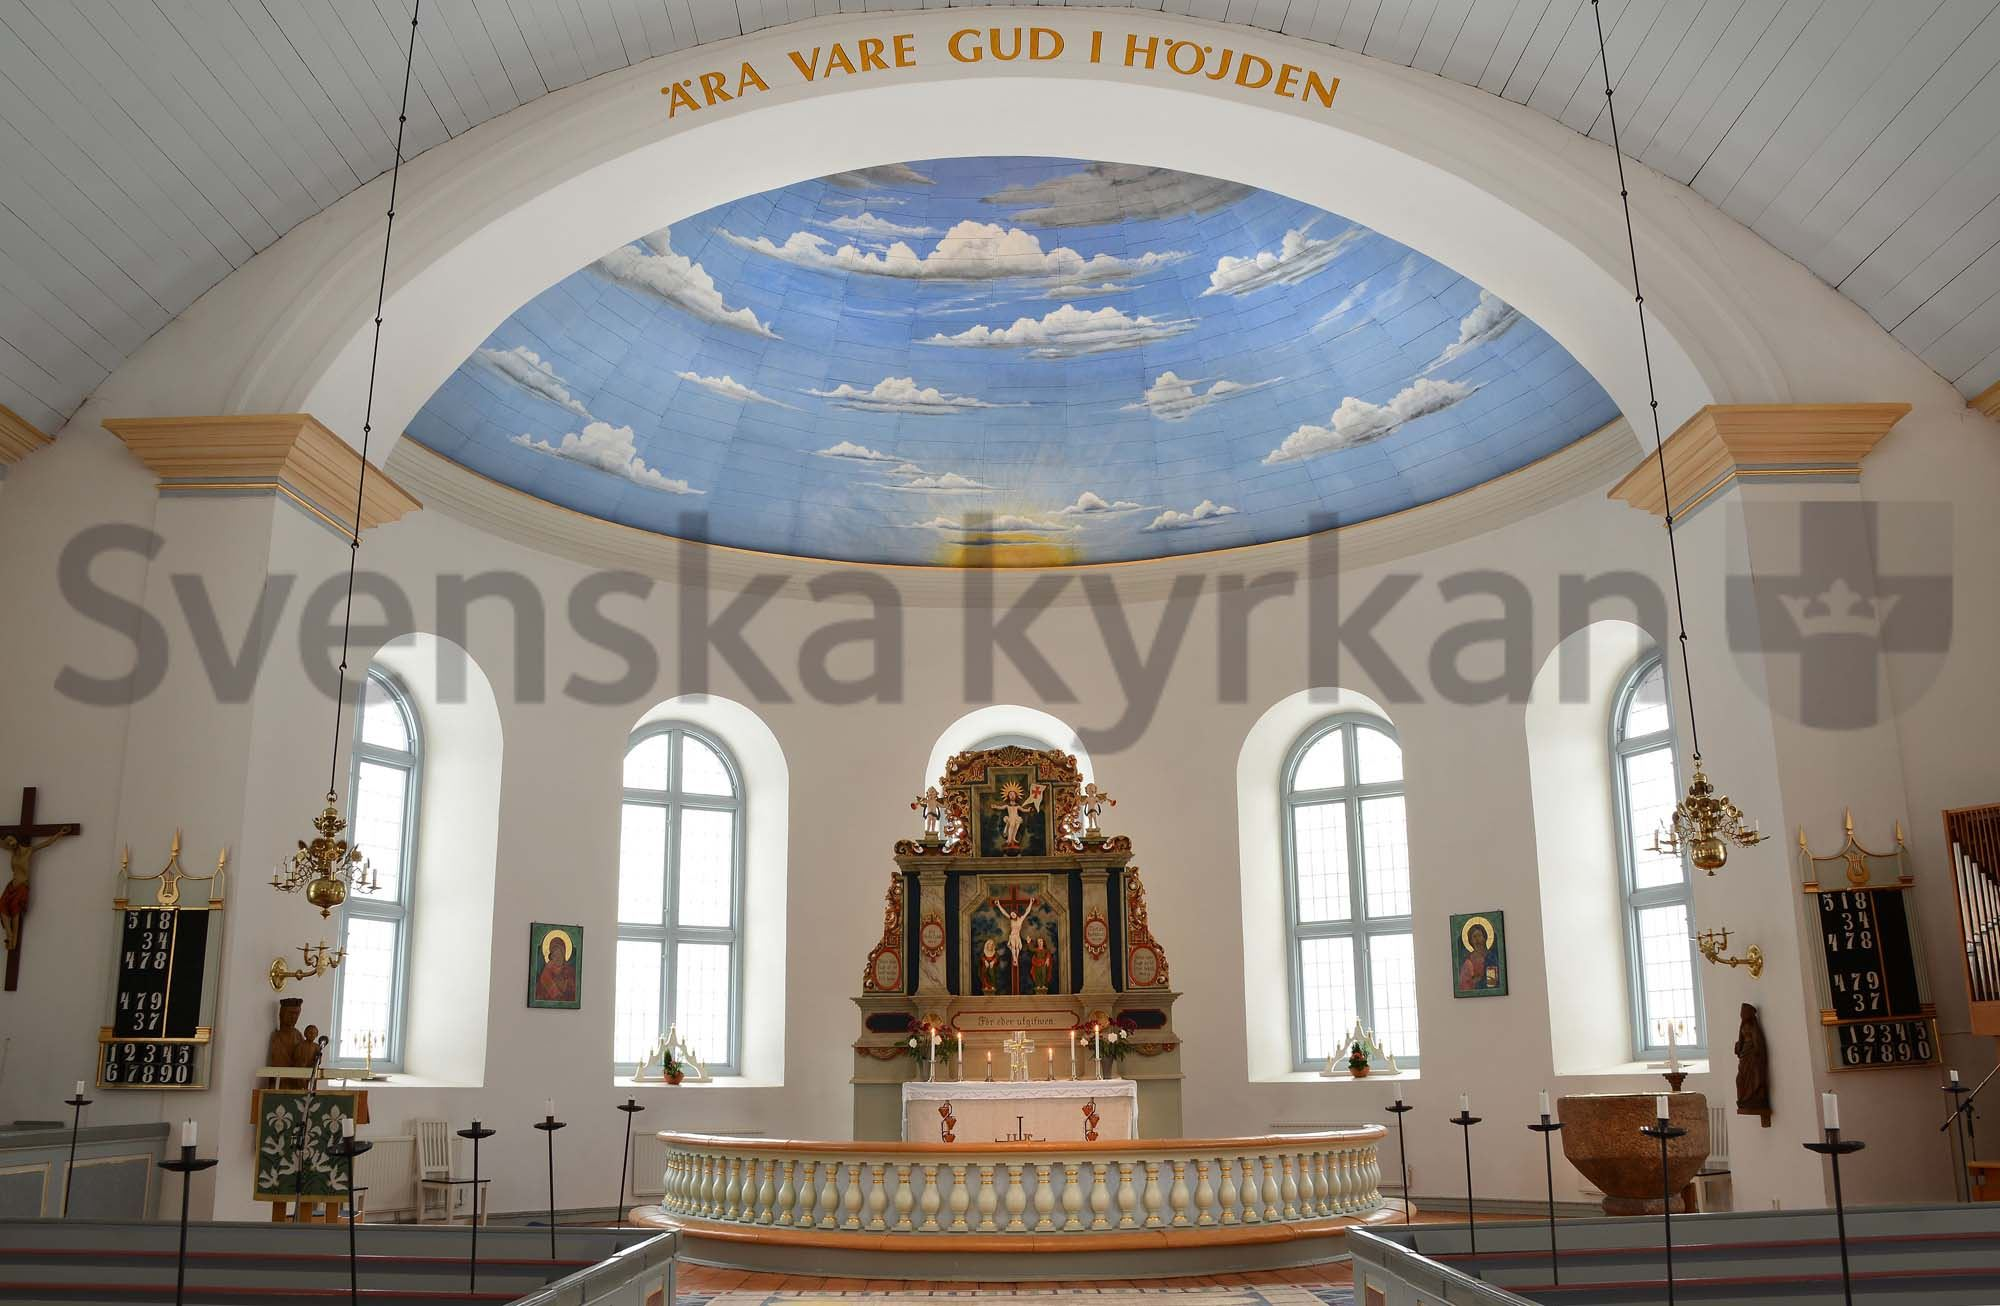 Bengt-Åke Fasth, Torpa kyrka